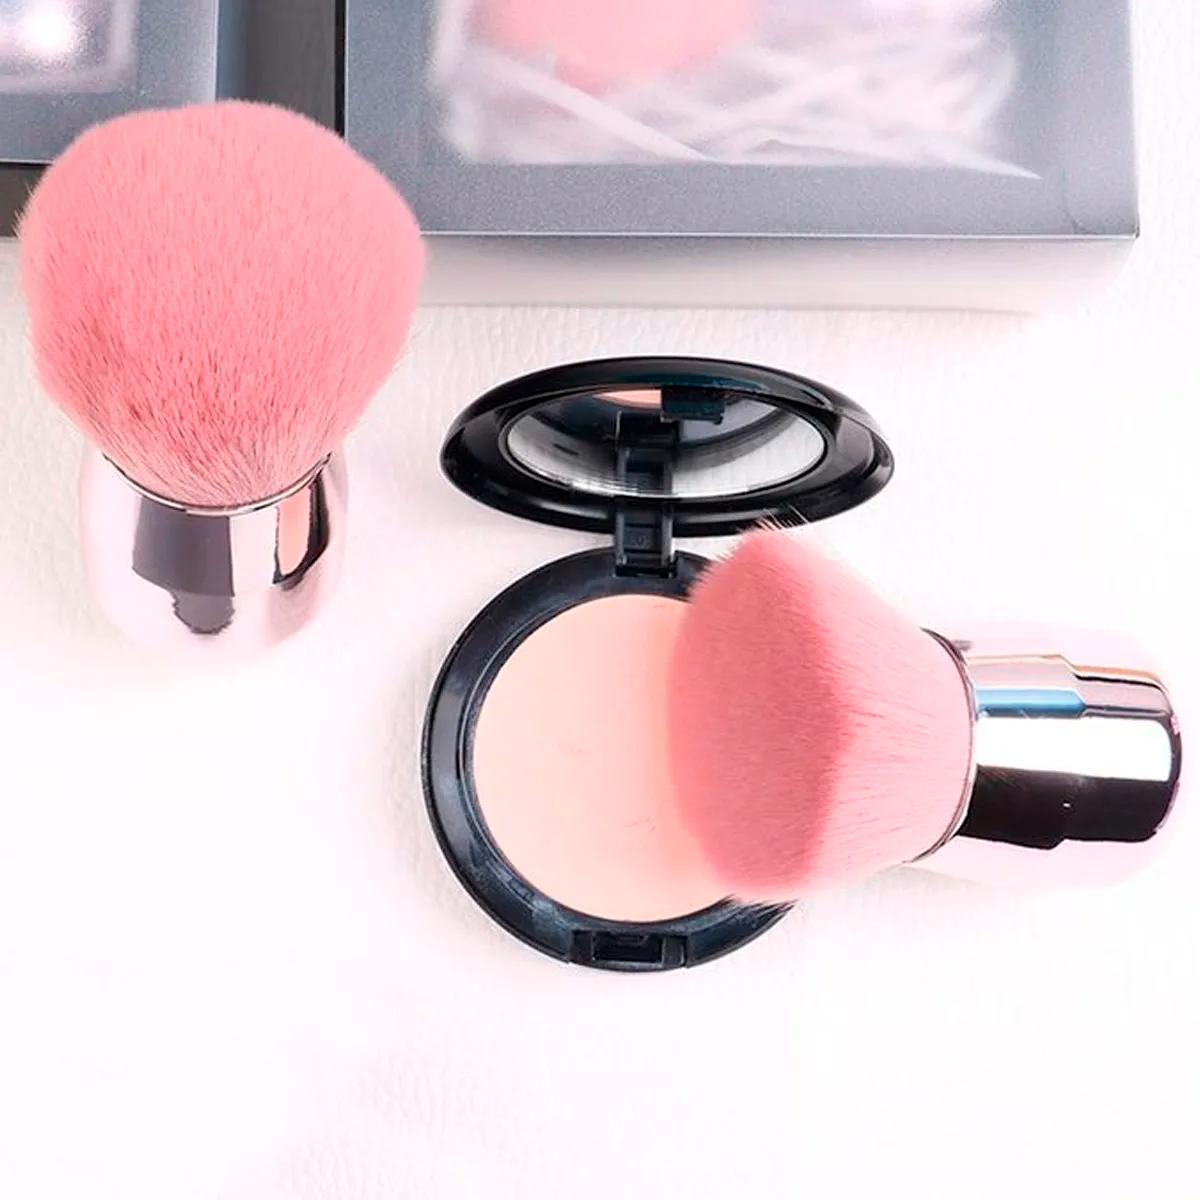 Brocha Kabuki Color Rosa Para Maquillaje, Redonda O Plana